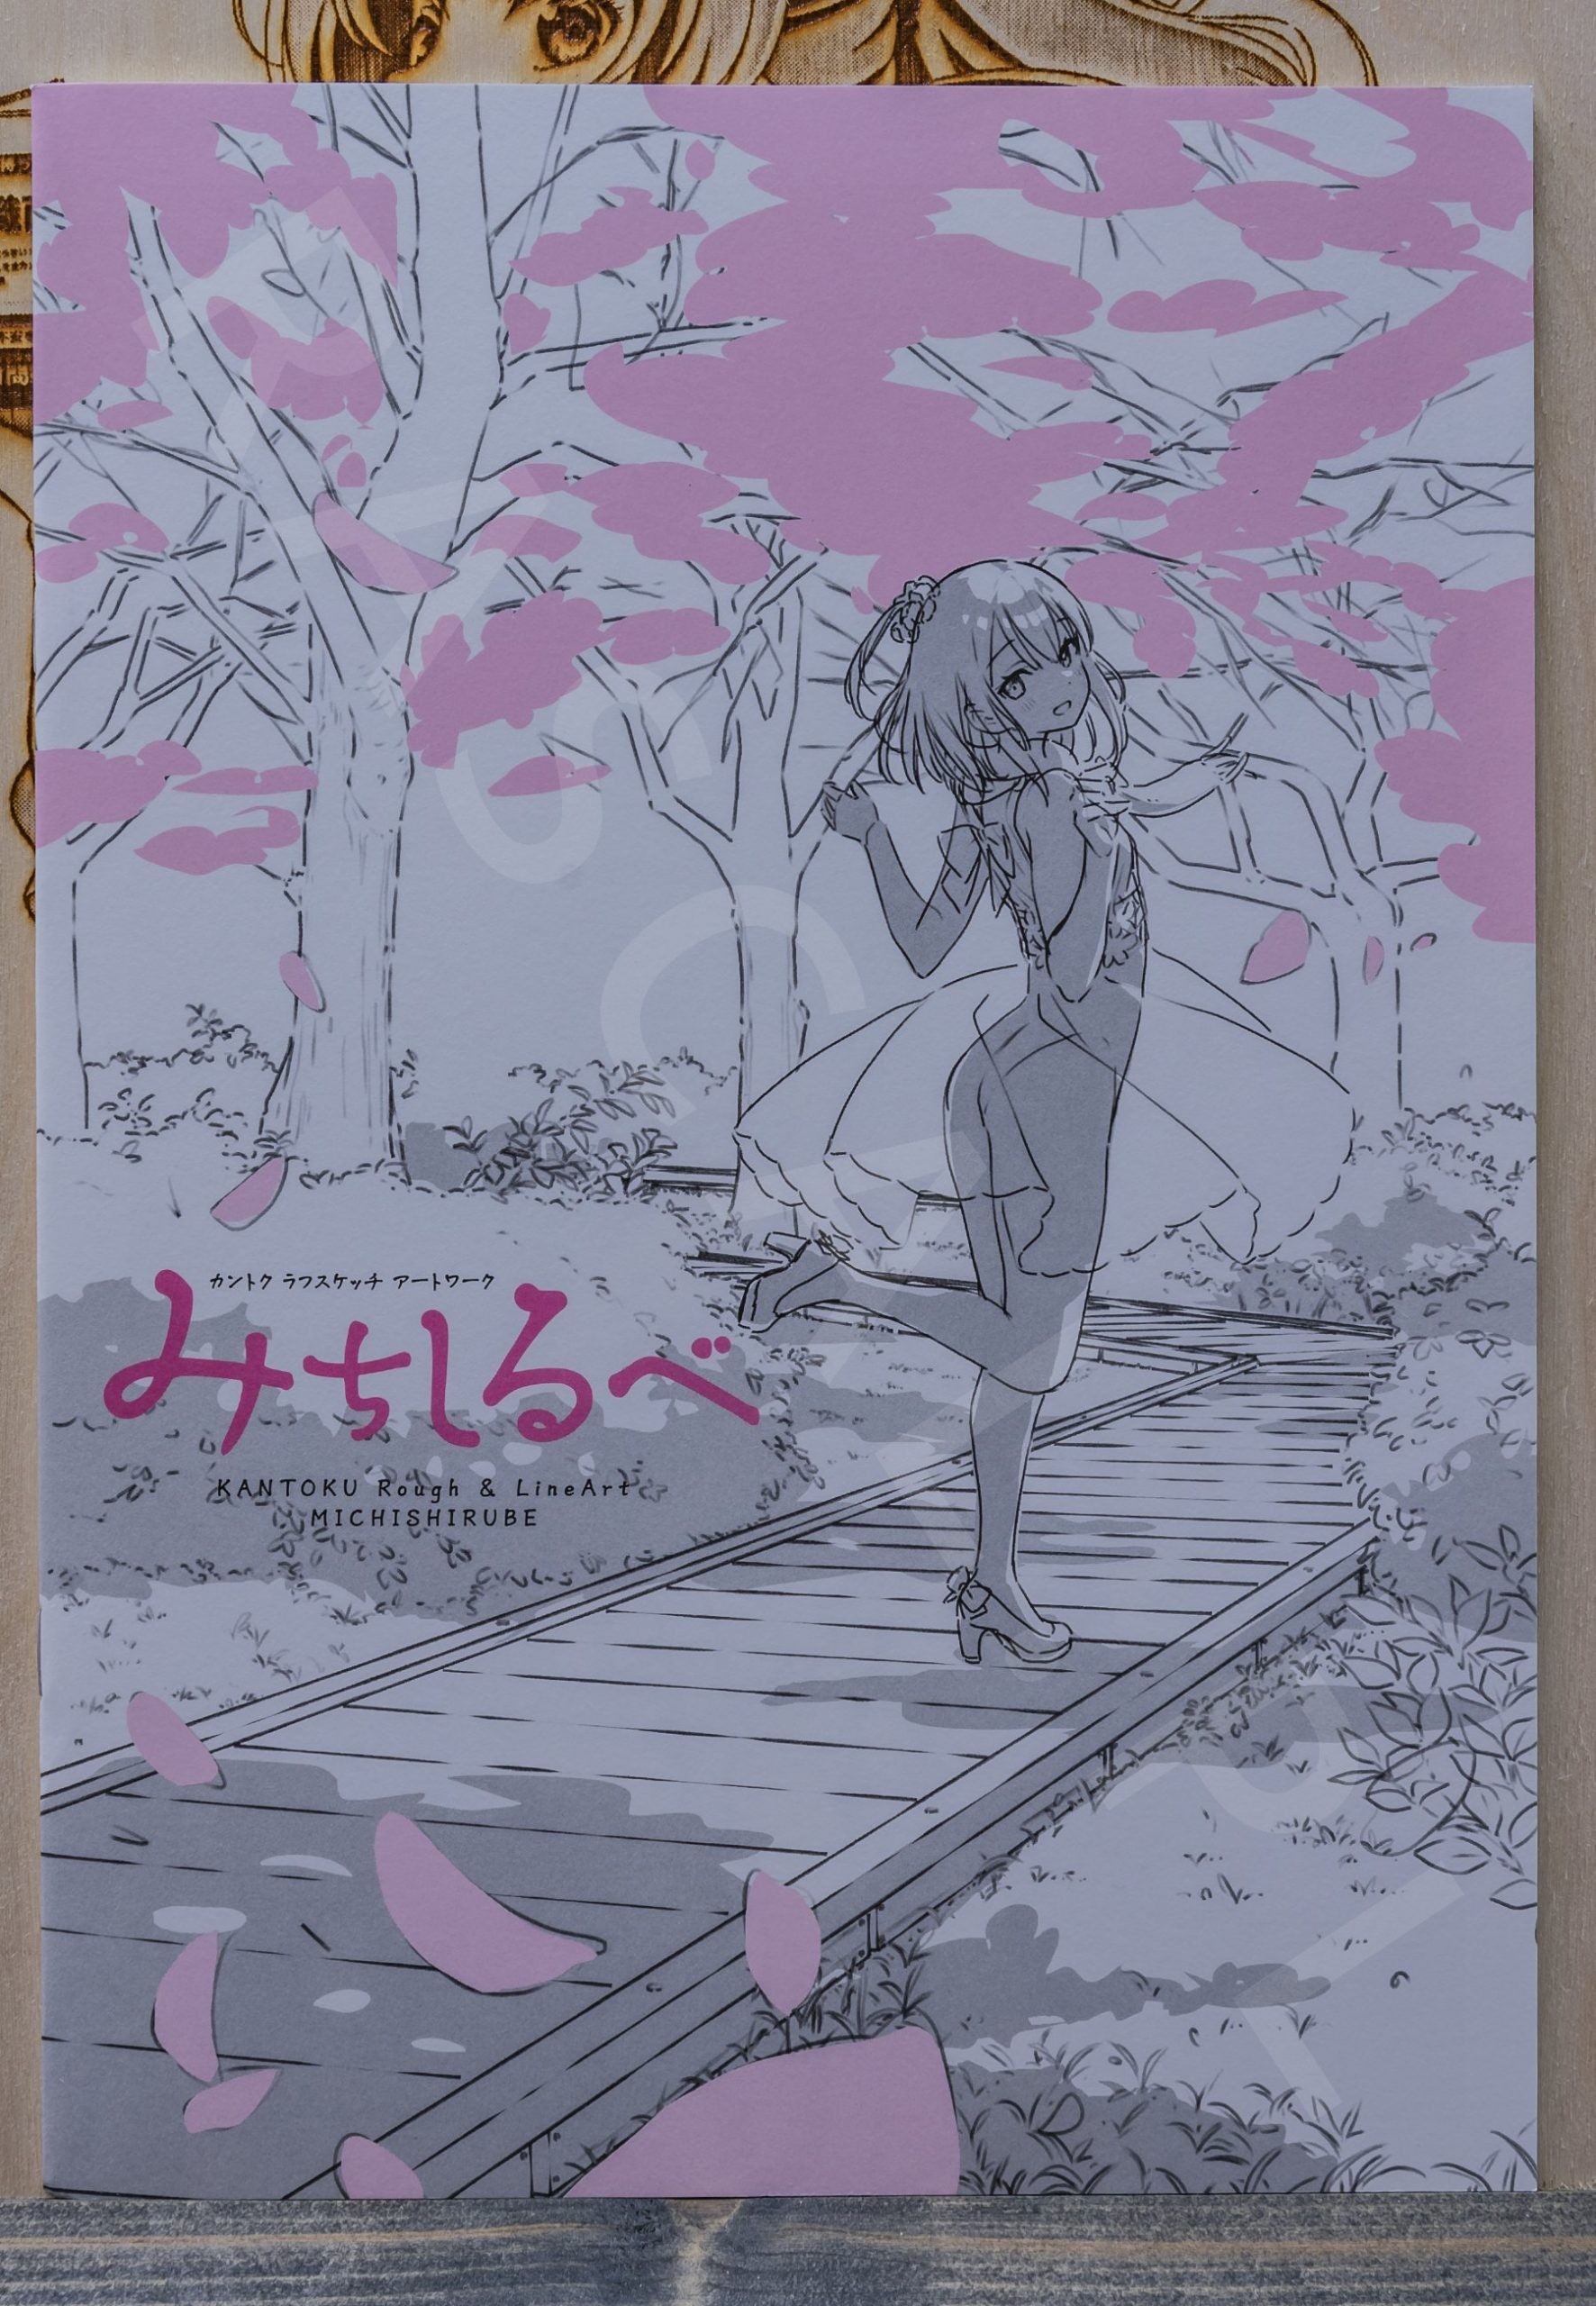 Kantoku - Yori Michi (Limited Edition) - recenzja artbooka - rascal.pl